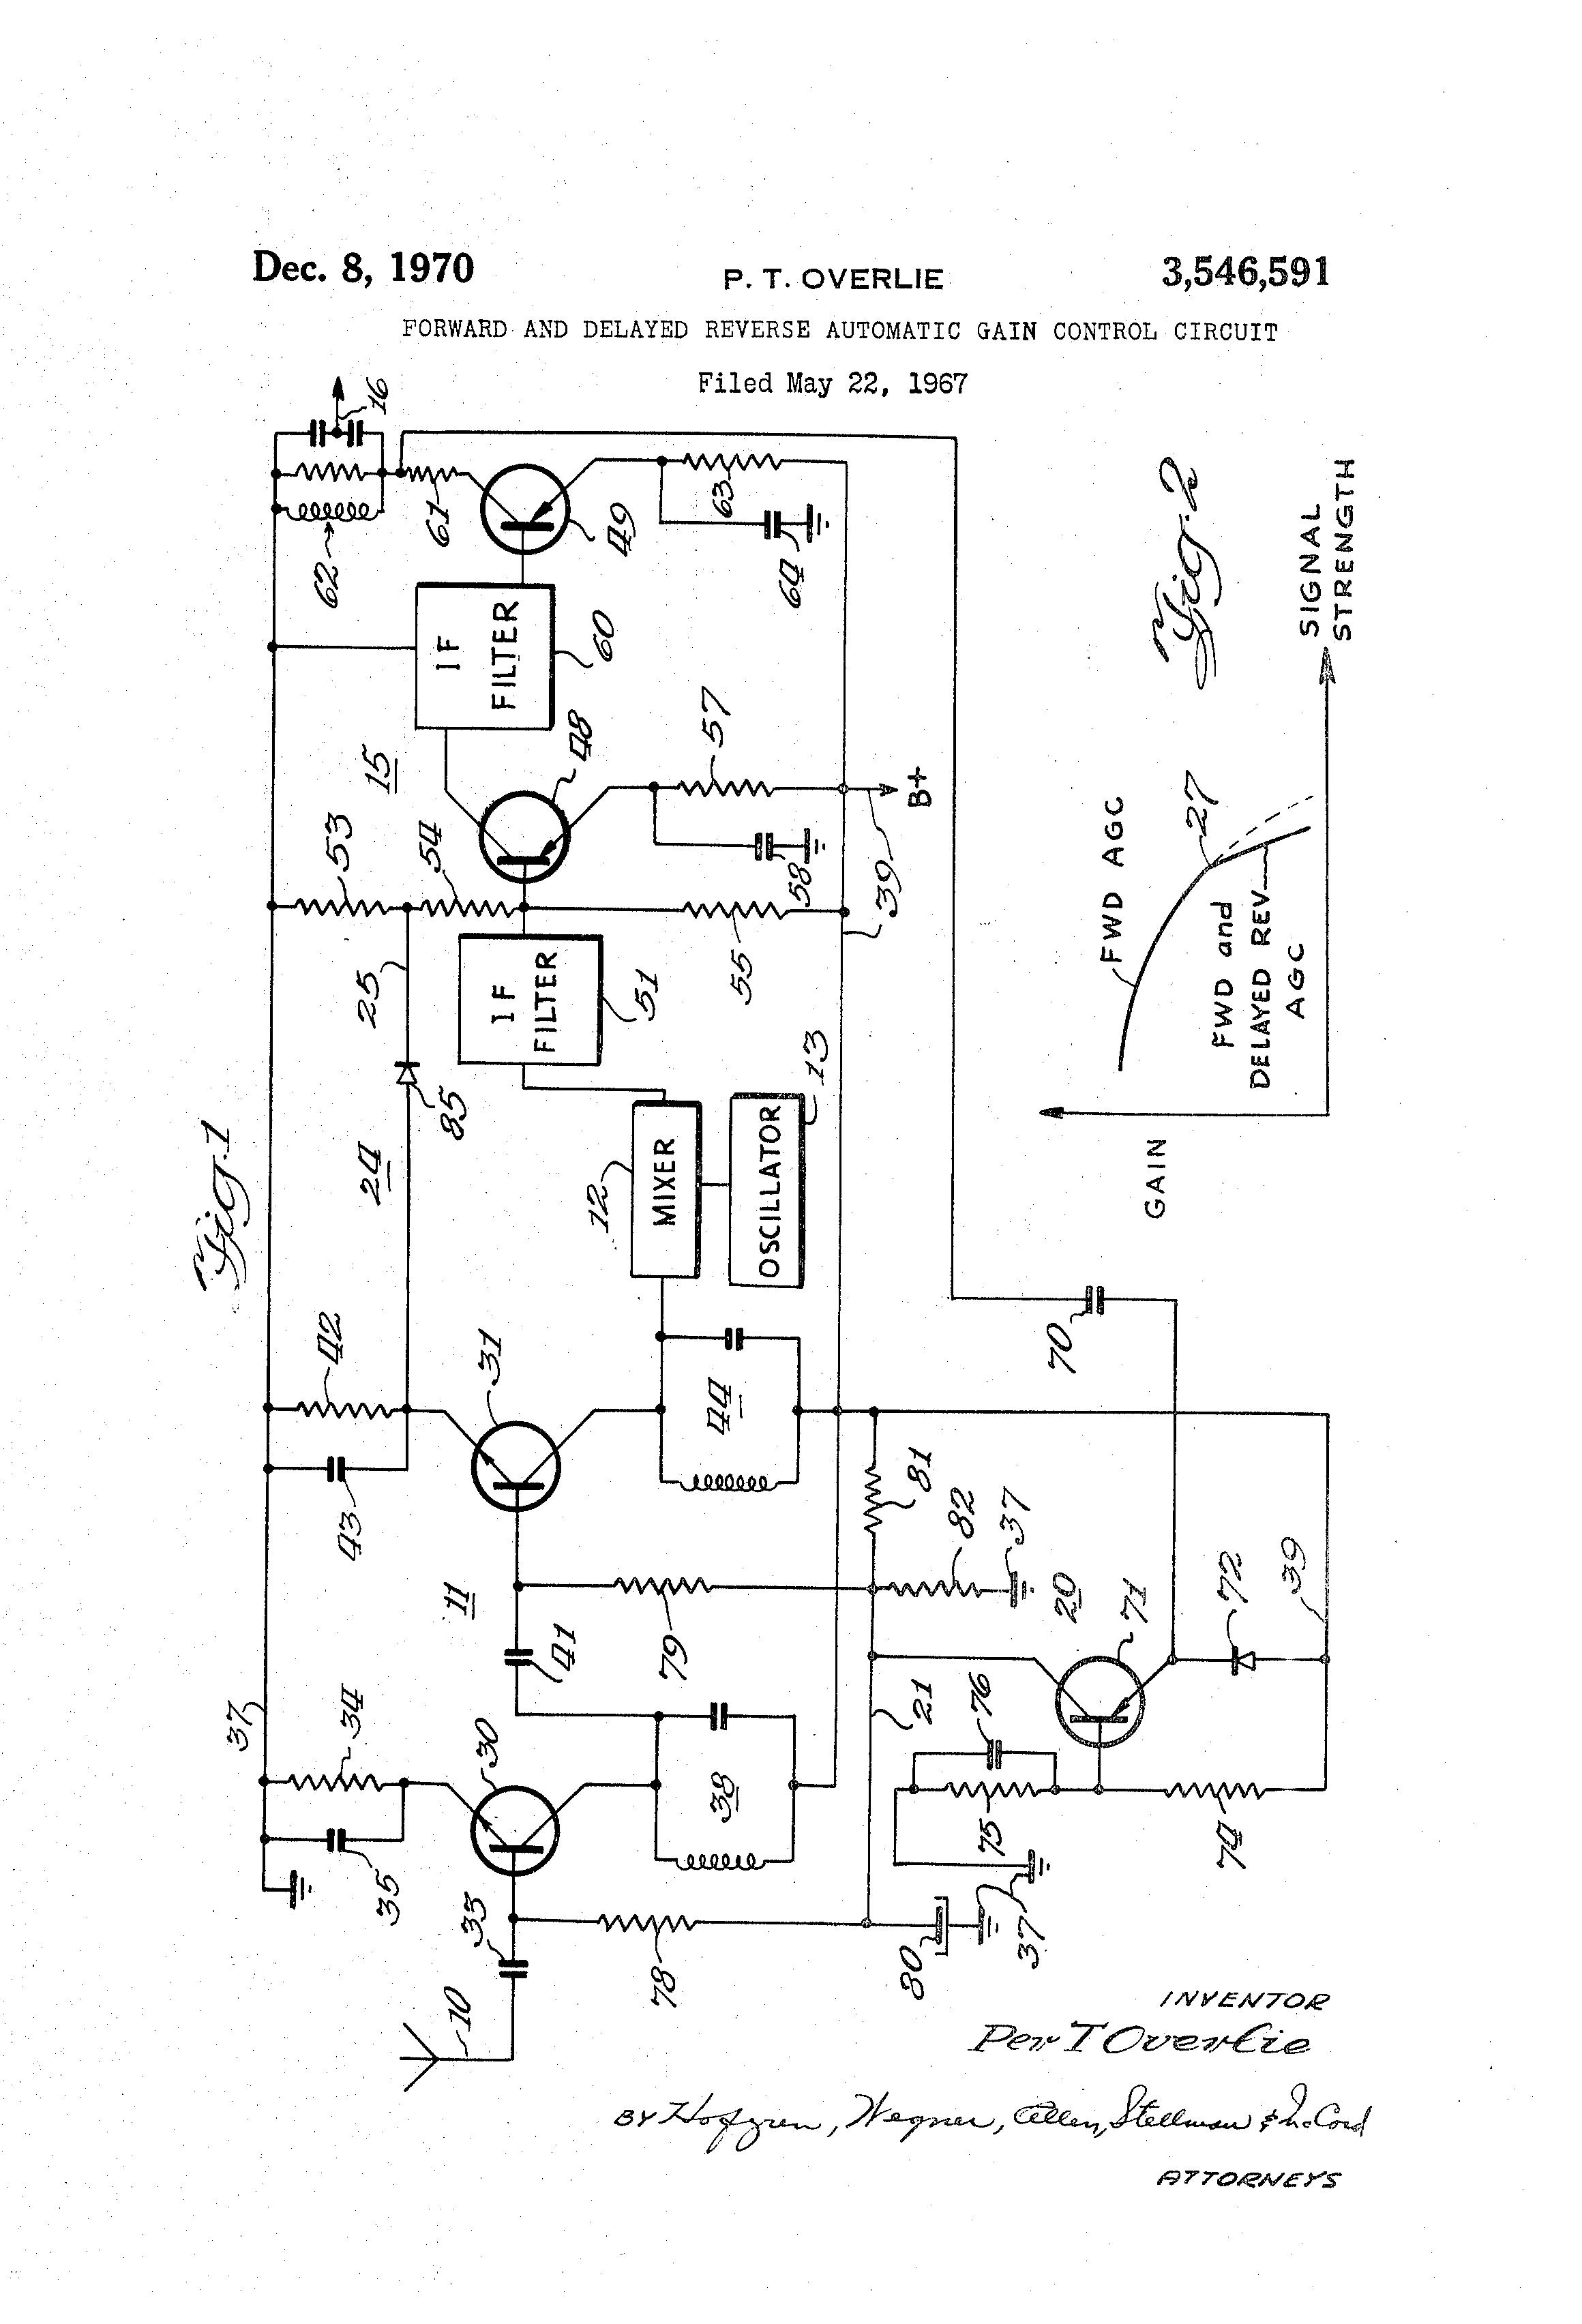 patentimages storage googleapis com/pages/US354659